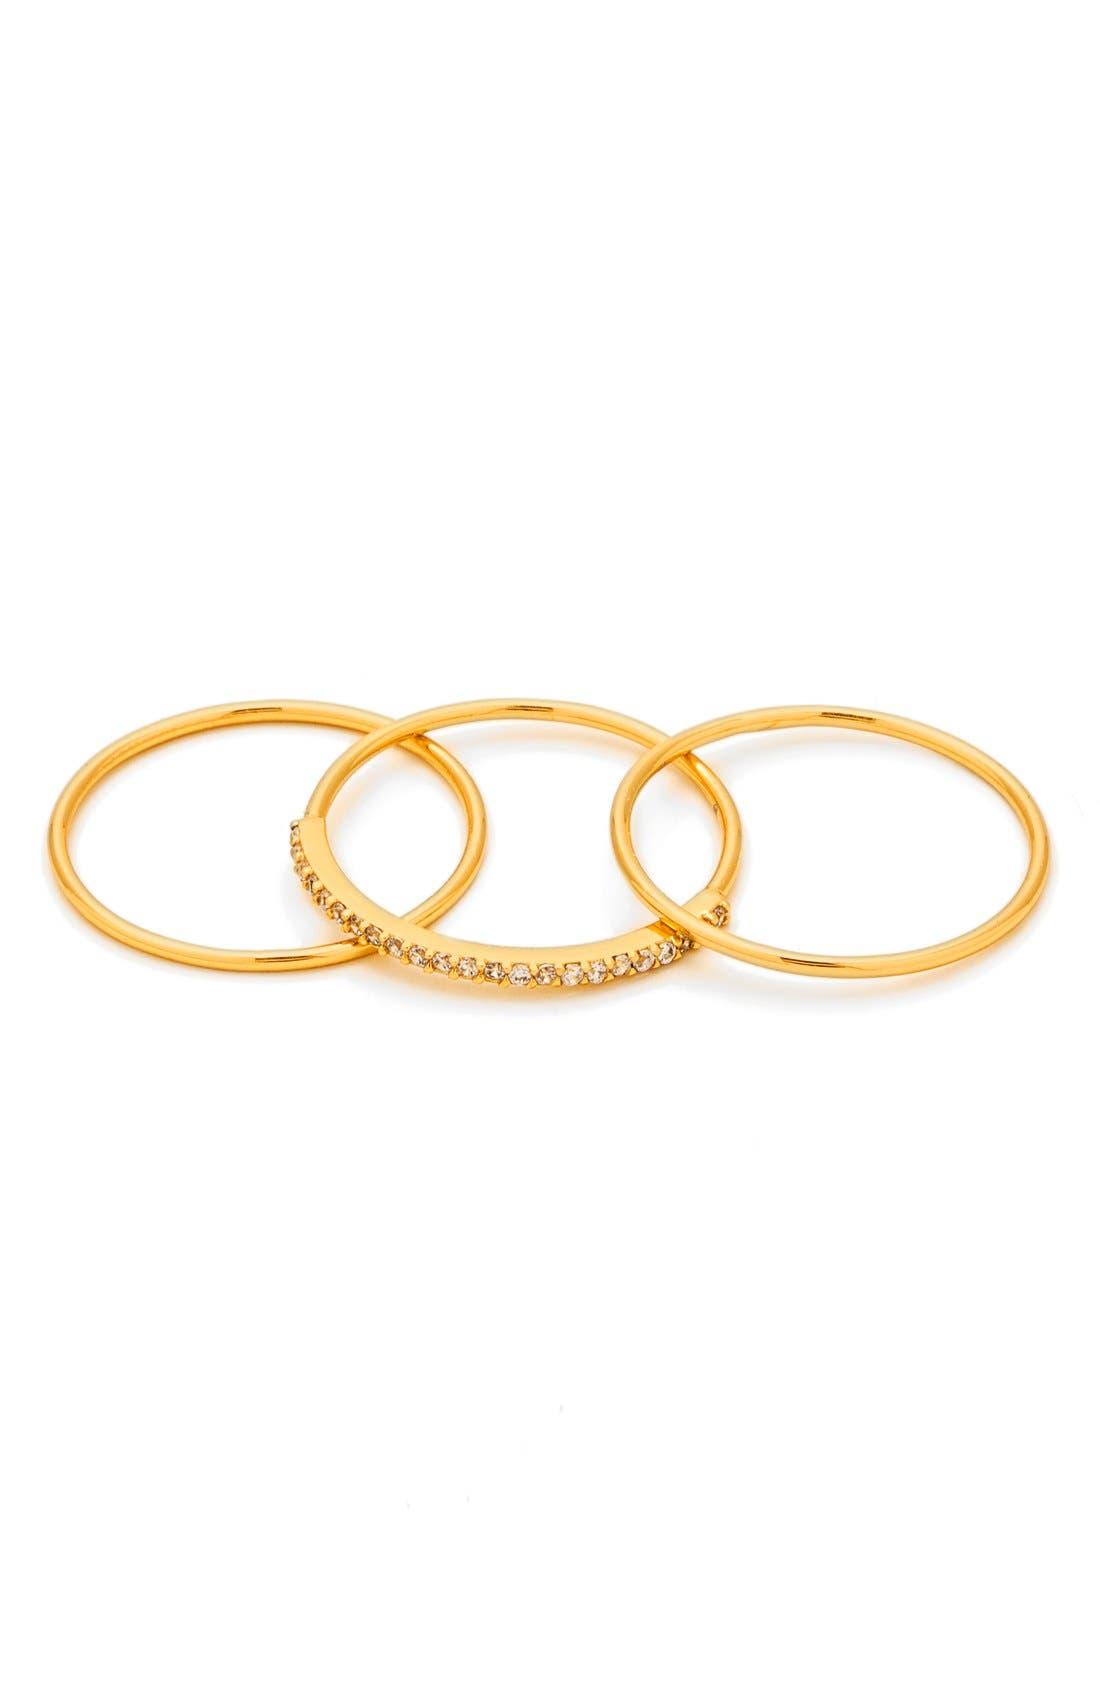 Shimmer Stackable Set of 3 Band Rings,                             Main thumbnail 1, color,                             Gold